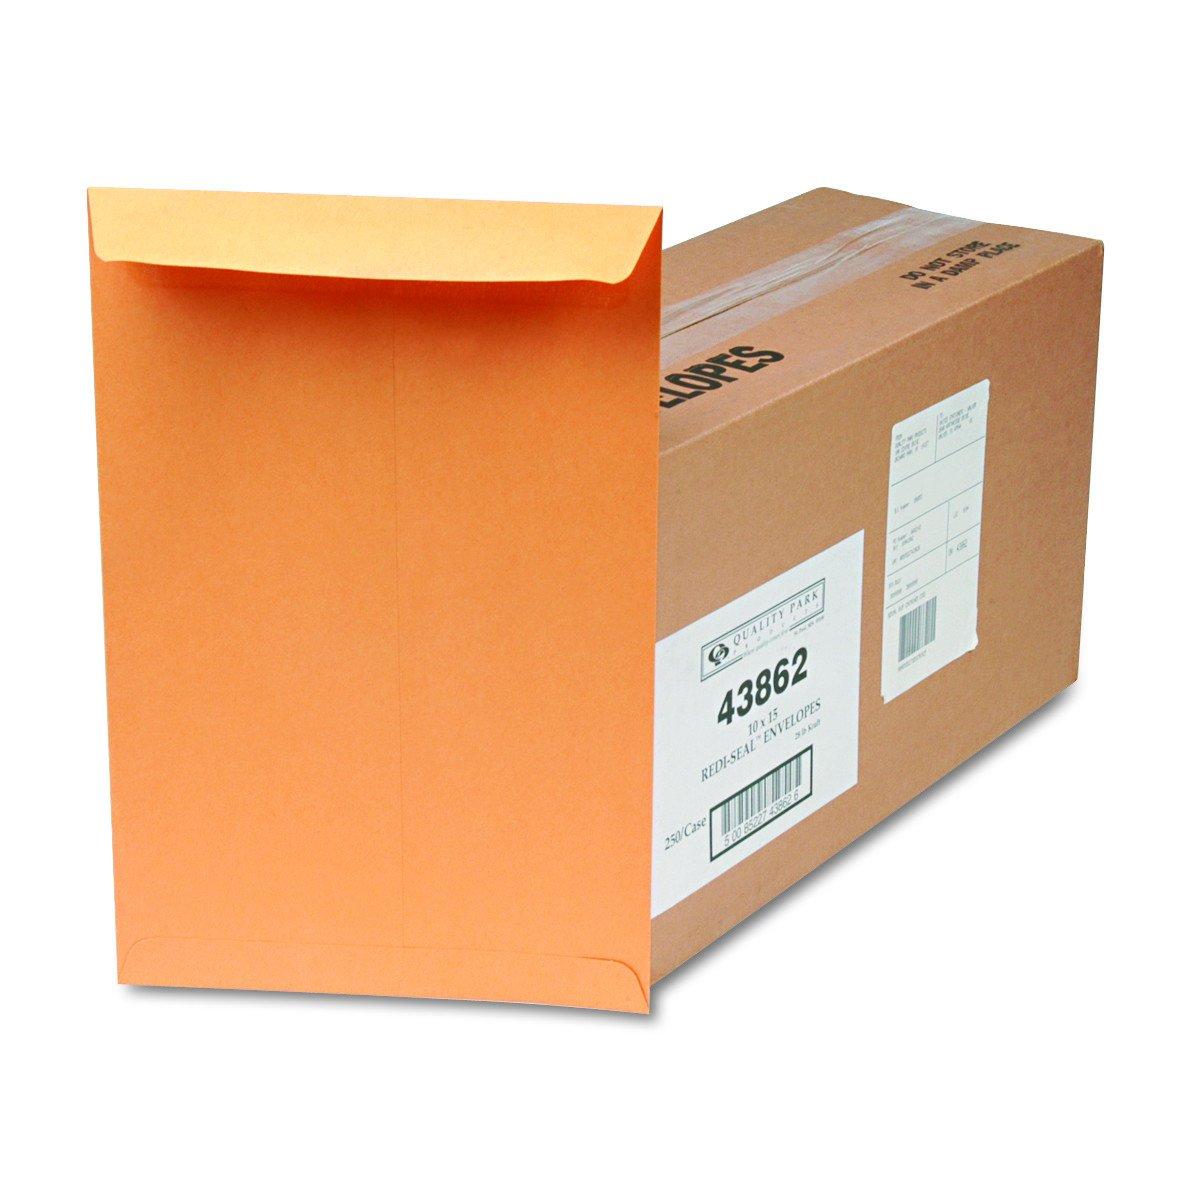 Quality Park 43862 Redi-Seal Catalog Envelope, 10 x 15, Brown Kraft (Box of 250)